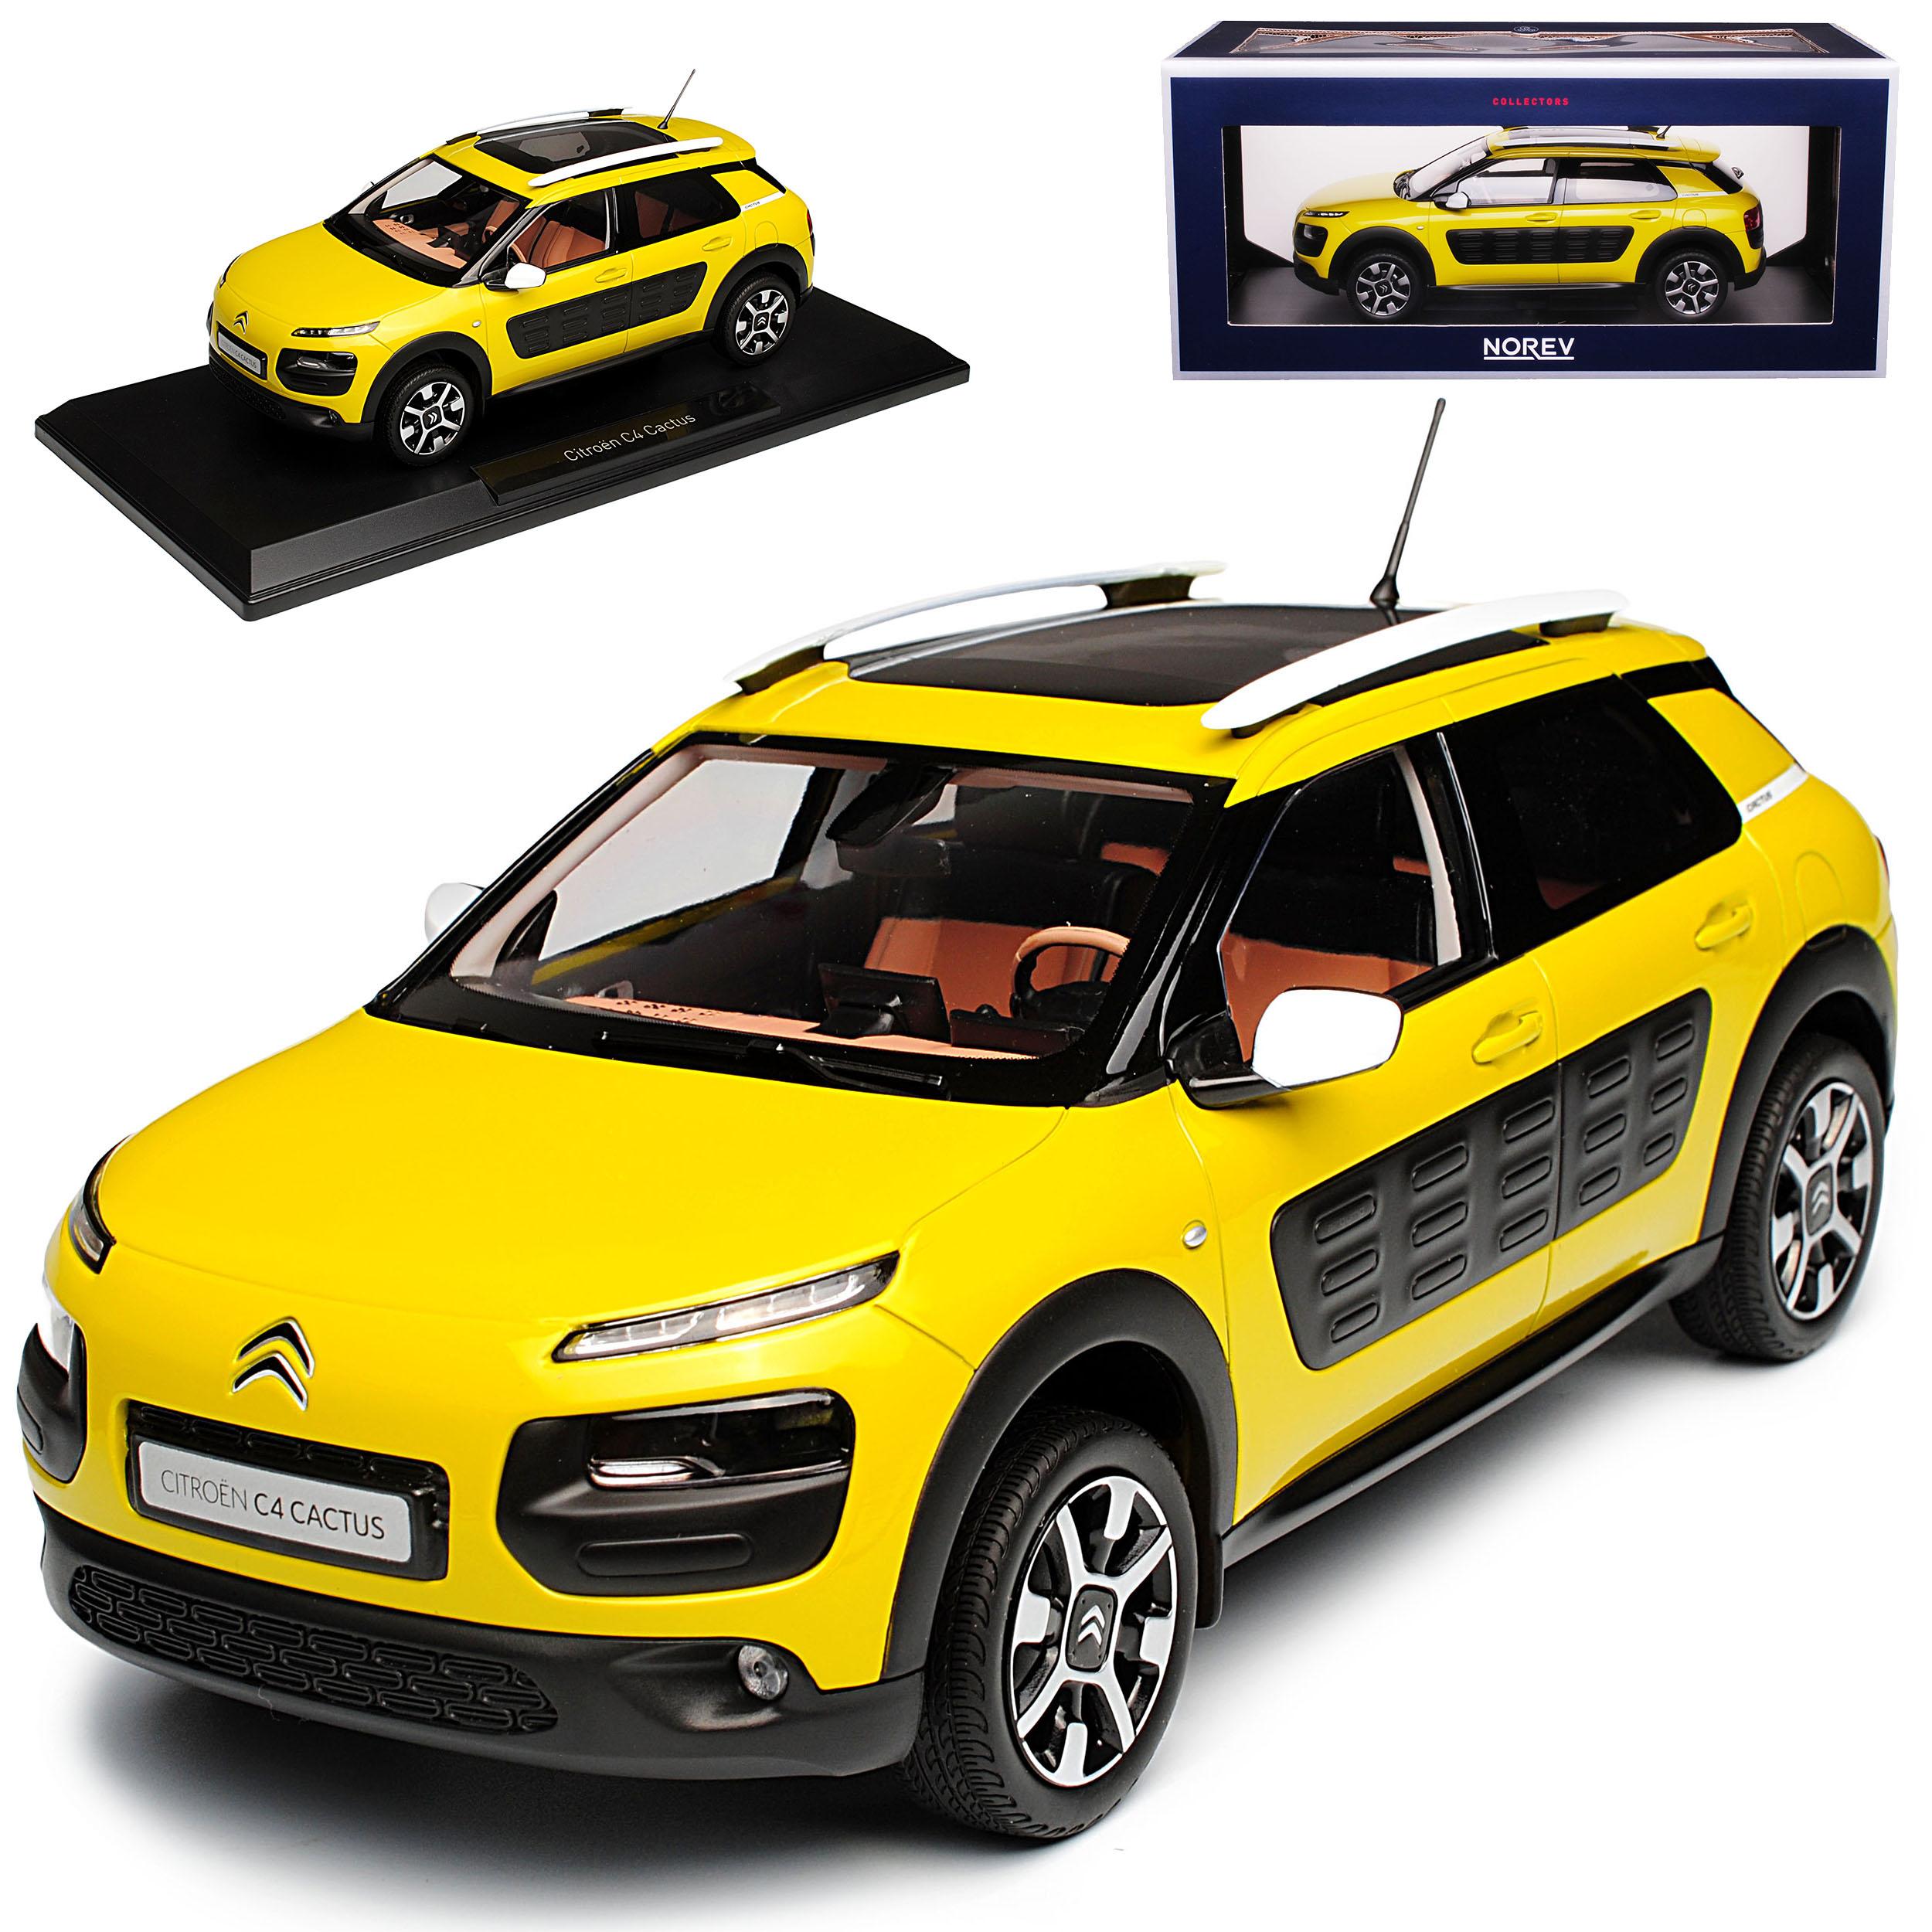 Citroen c4 cactus SUV verde giallo metalizado 1. Generation 2014-2018 1 18 norev mo...